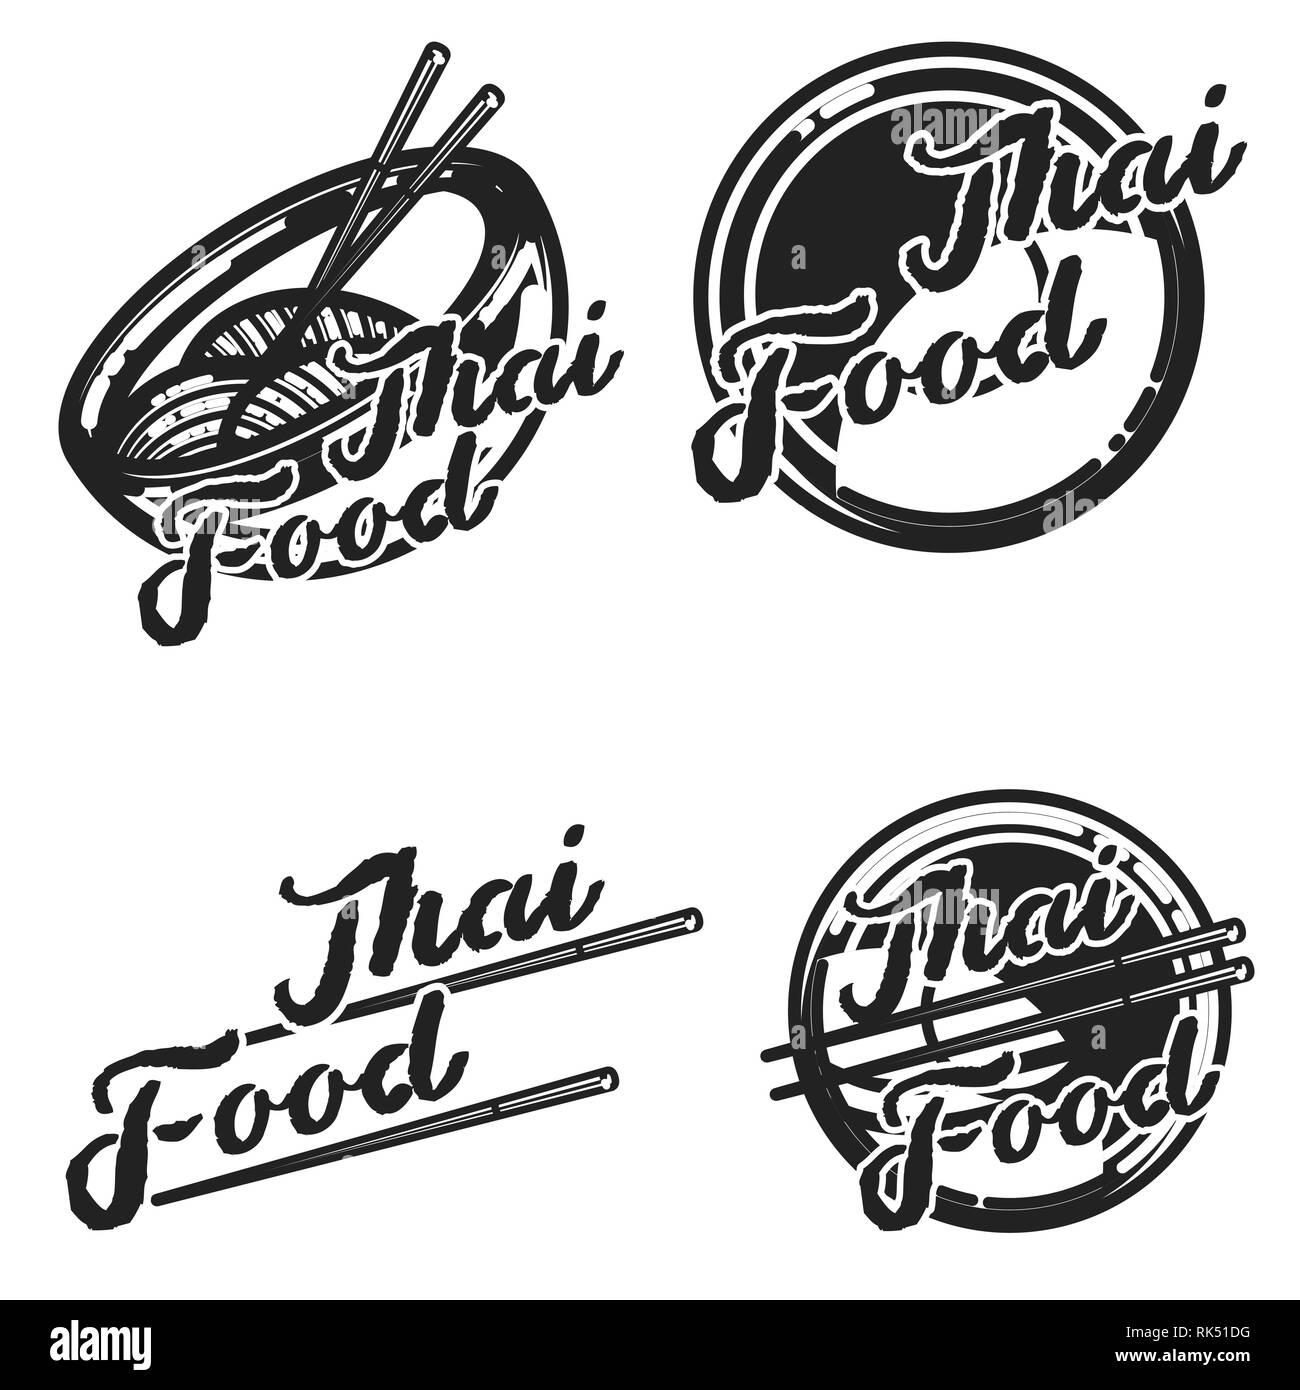 Color Vintage Thai Food Emblems Logos Badges Banners Emblems For Asian Food Restaurant Vector Illustration Stock Vector Image Art Alamy